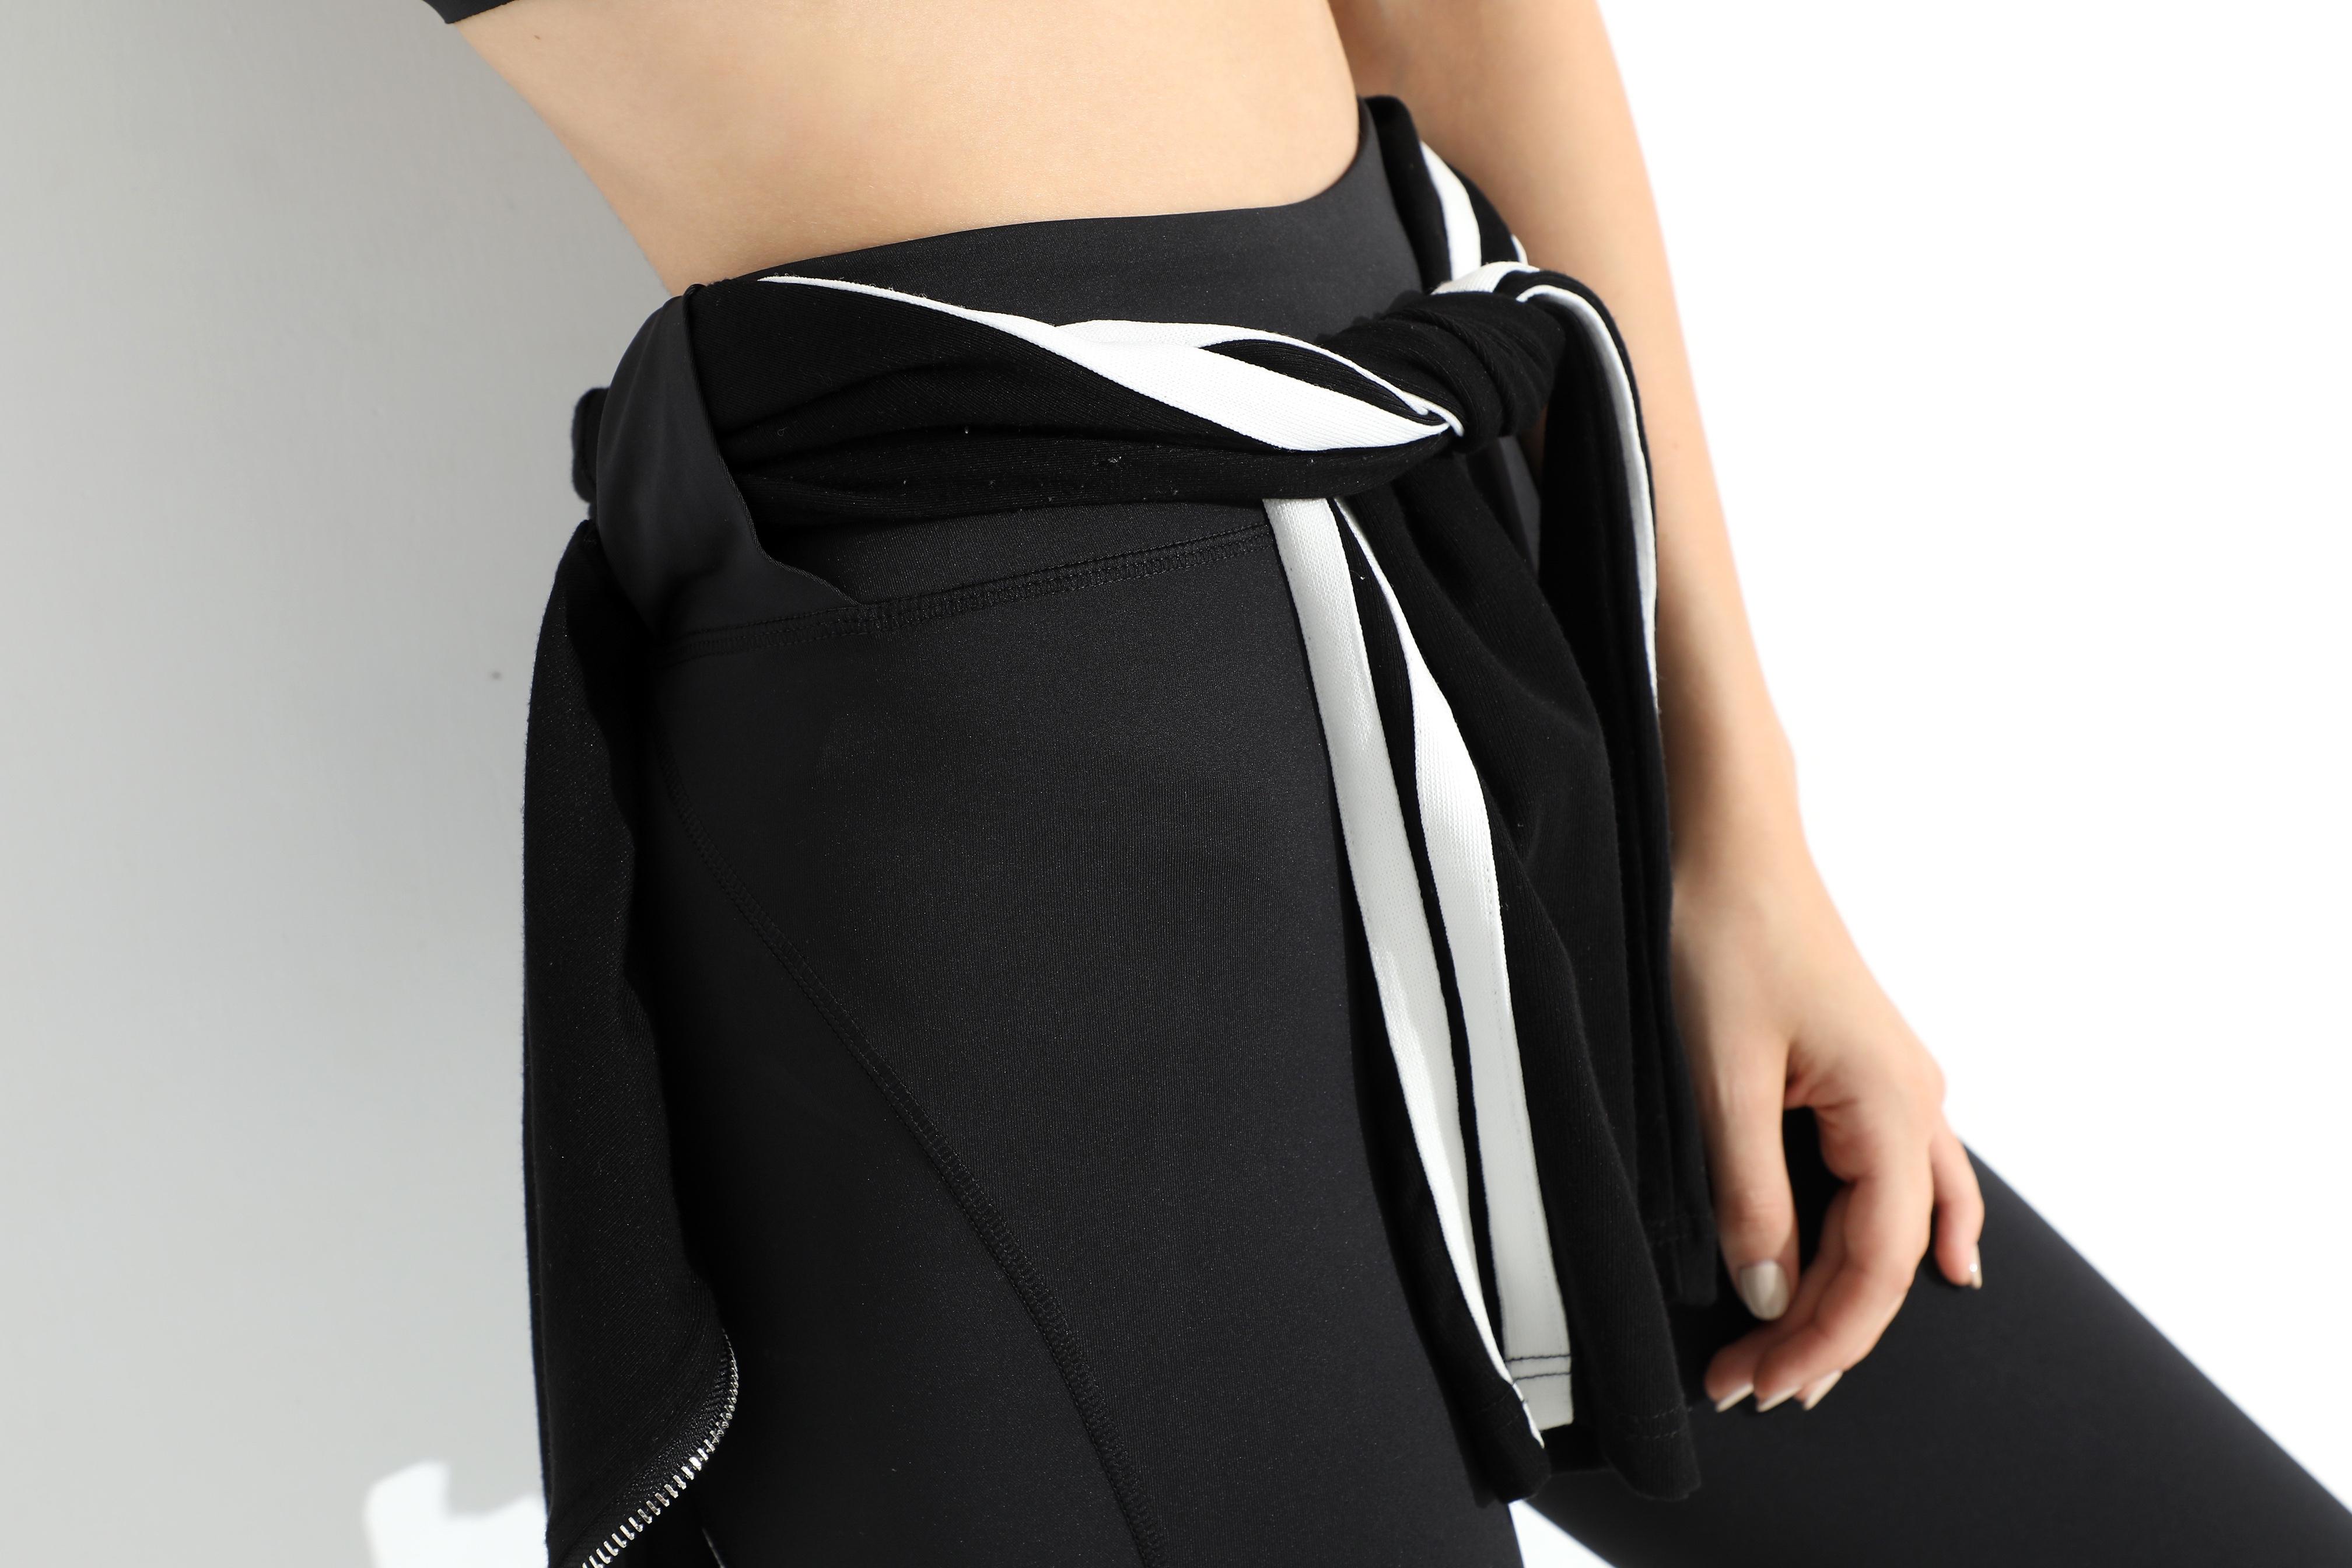 Sdare SuperCool 高腰褲耳彈力緊身運動褲 3色